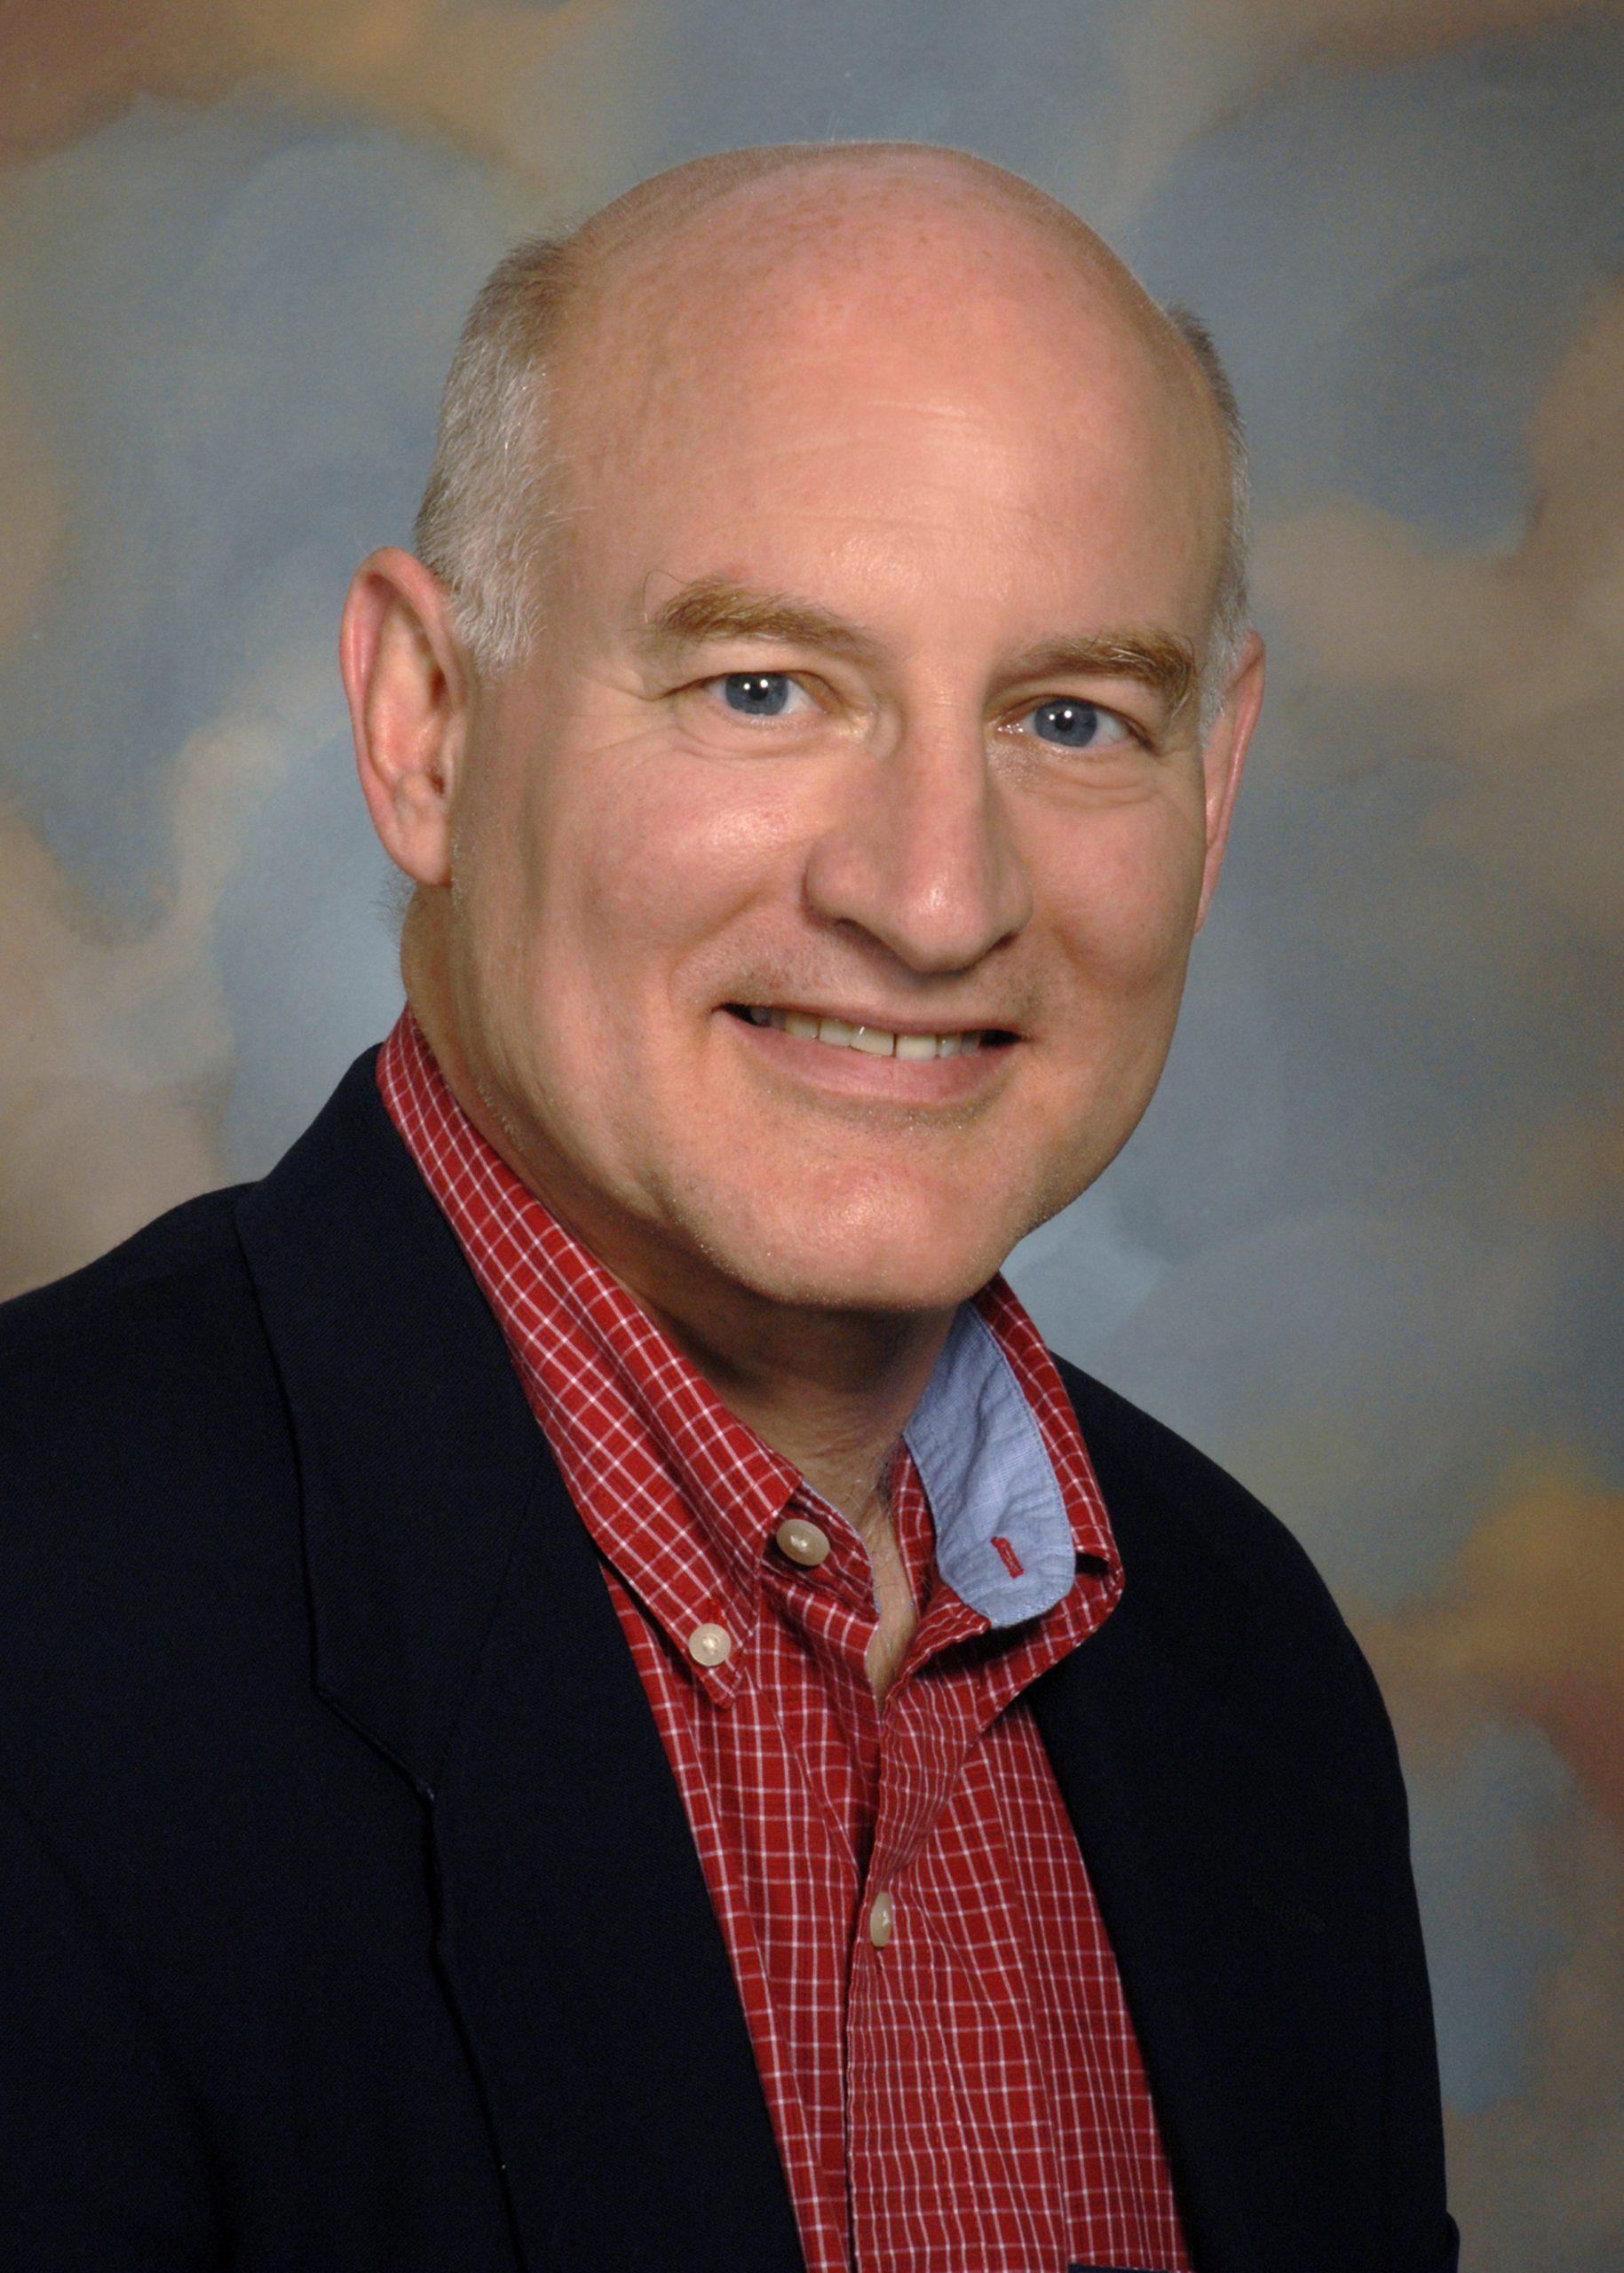 Wes Sundquist